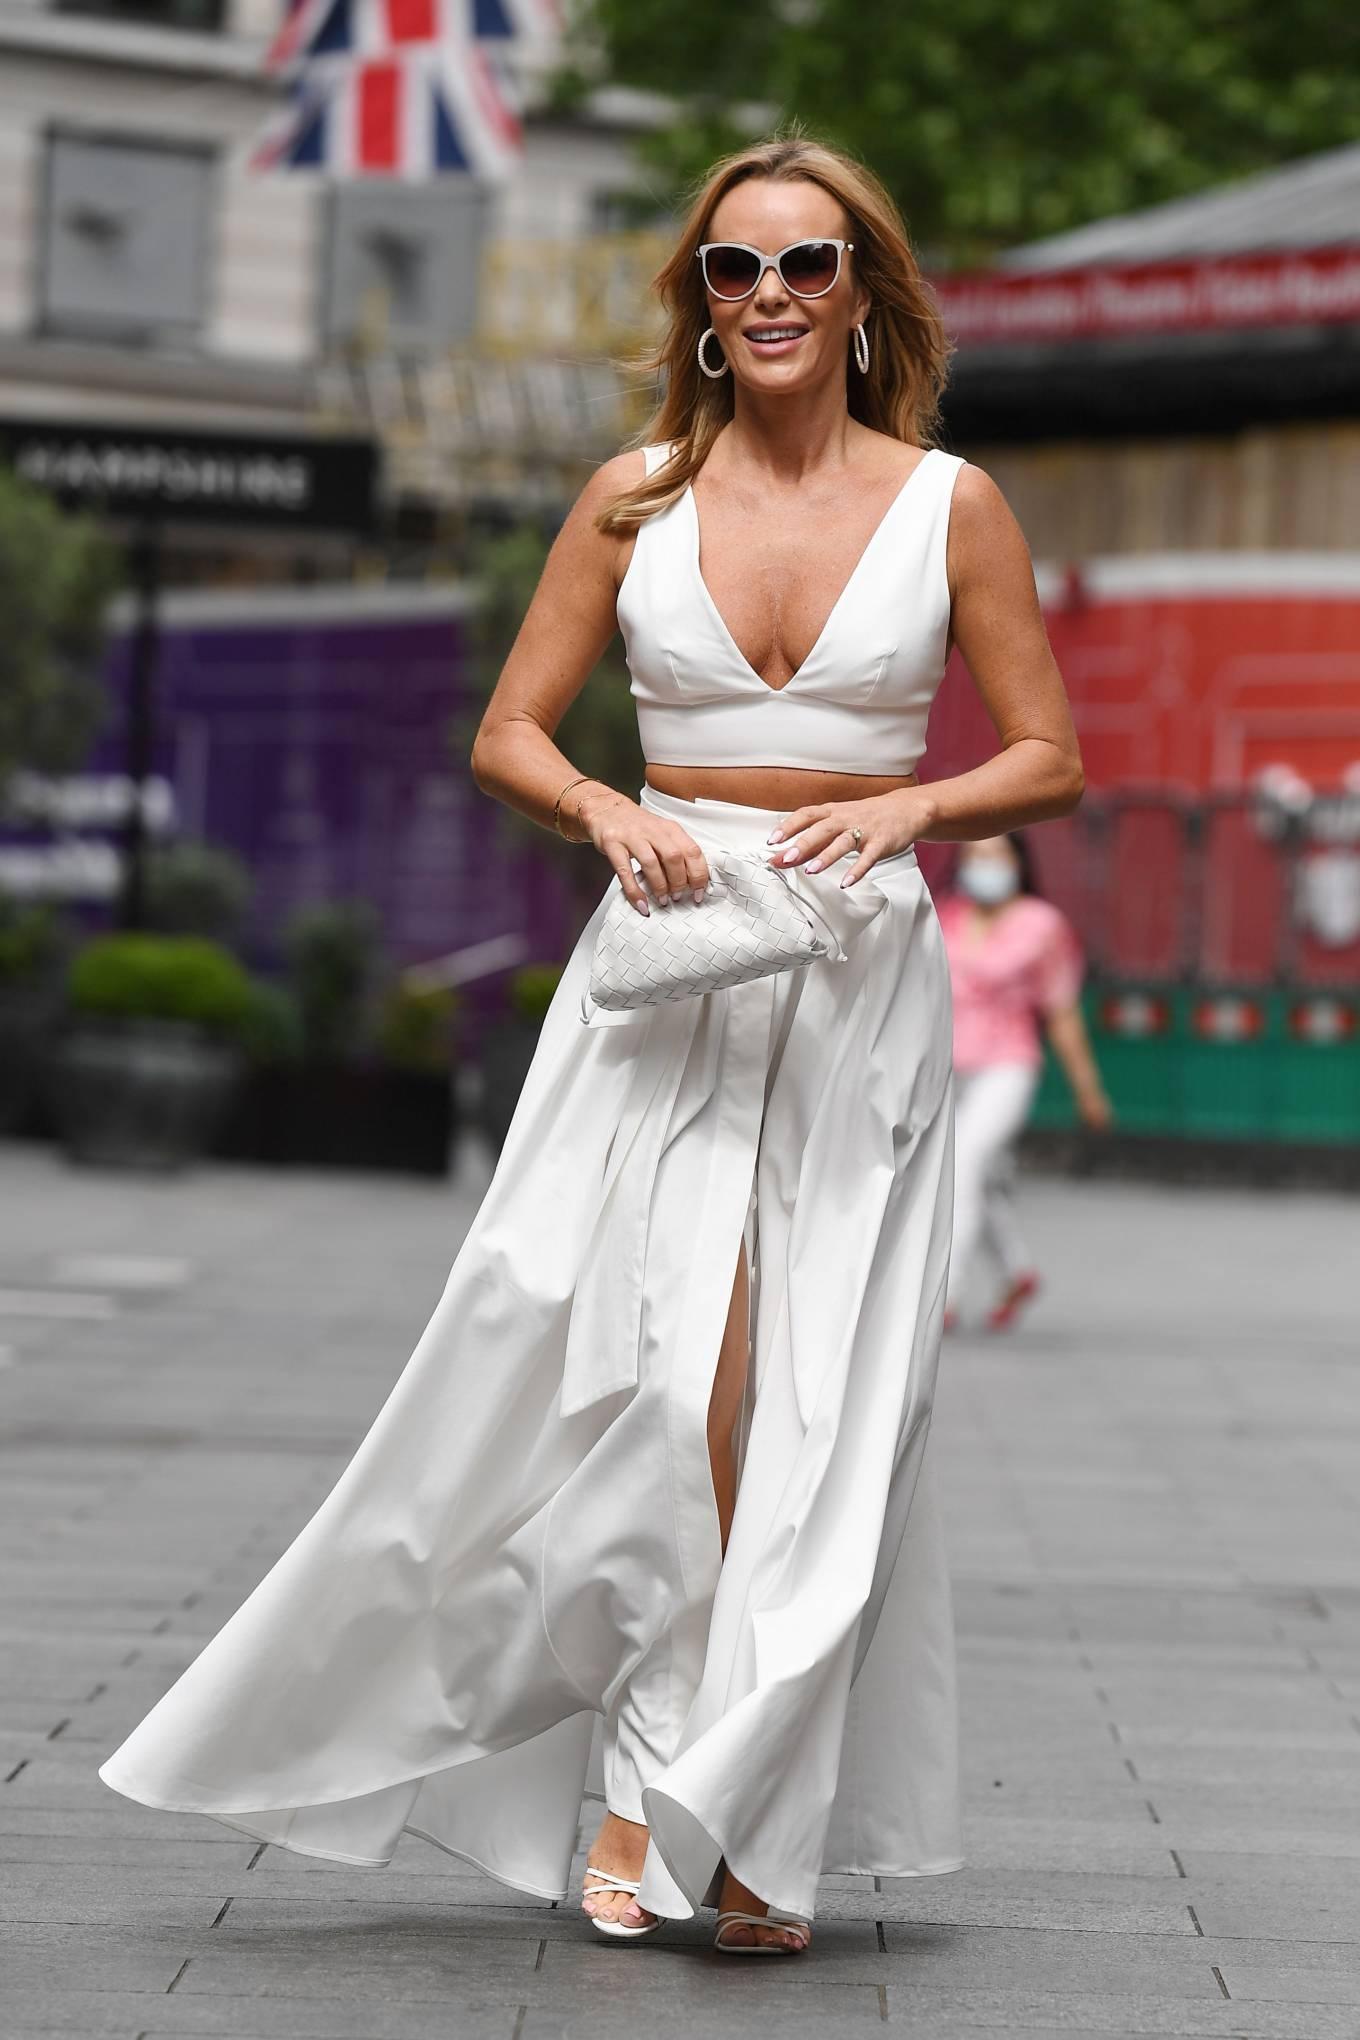 Amanda Holden 2021 : Amanda Holden – In a white dress at Global Studios in London-16